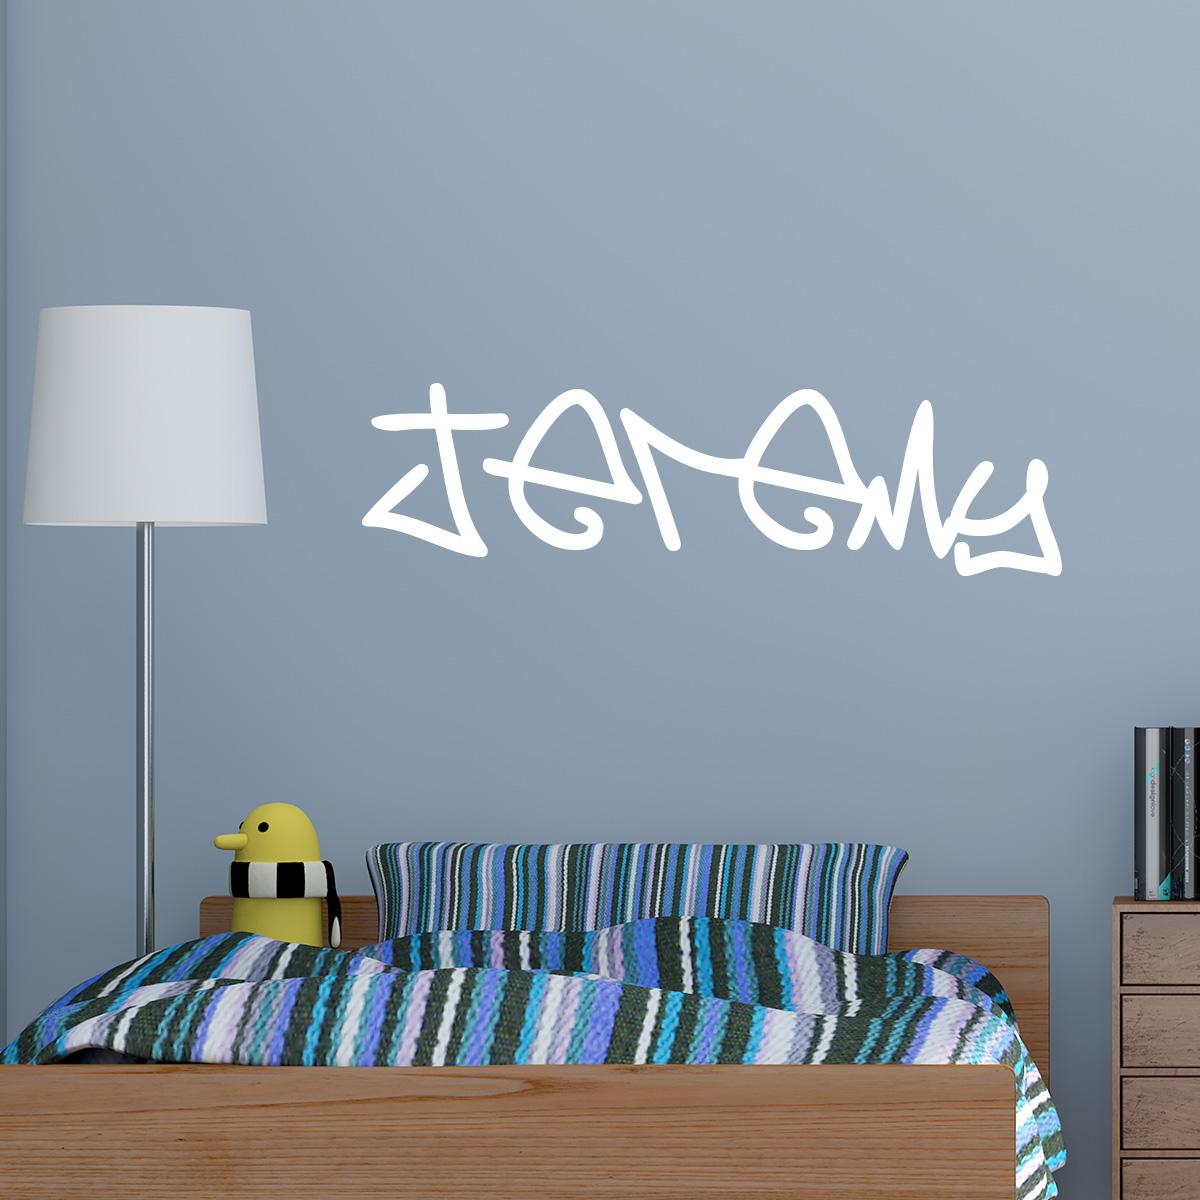 sticker pr nom personnalisable tag manuscrit stickers. Black Bedroom Furniture Sets. Home Design Ideas